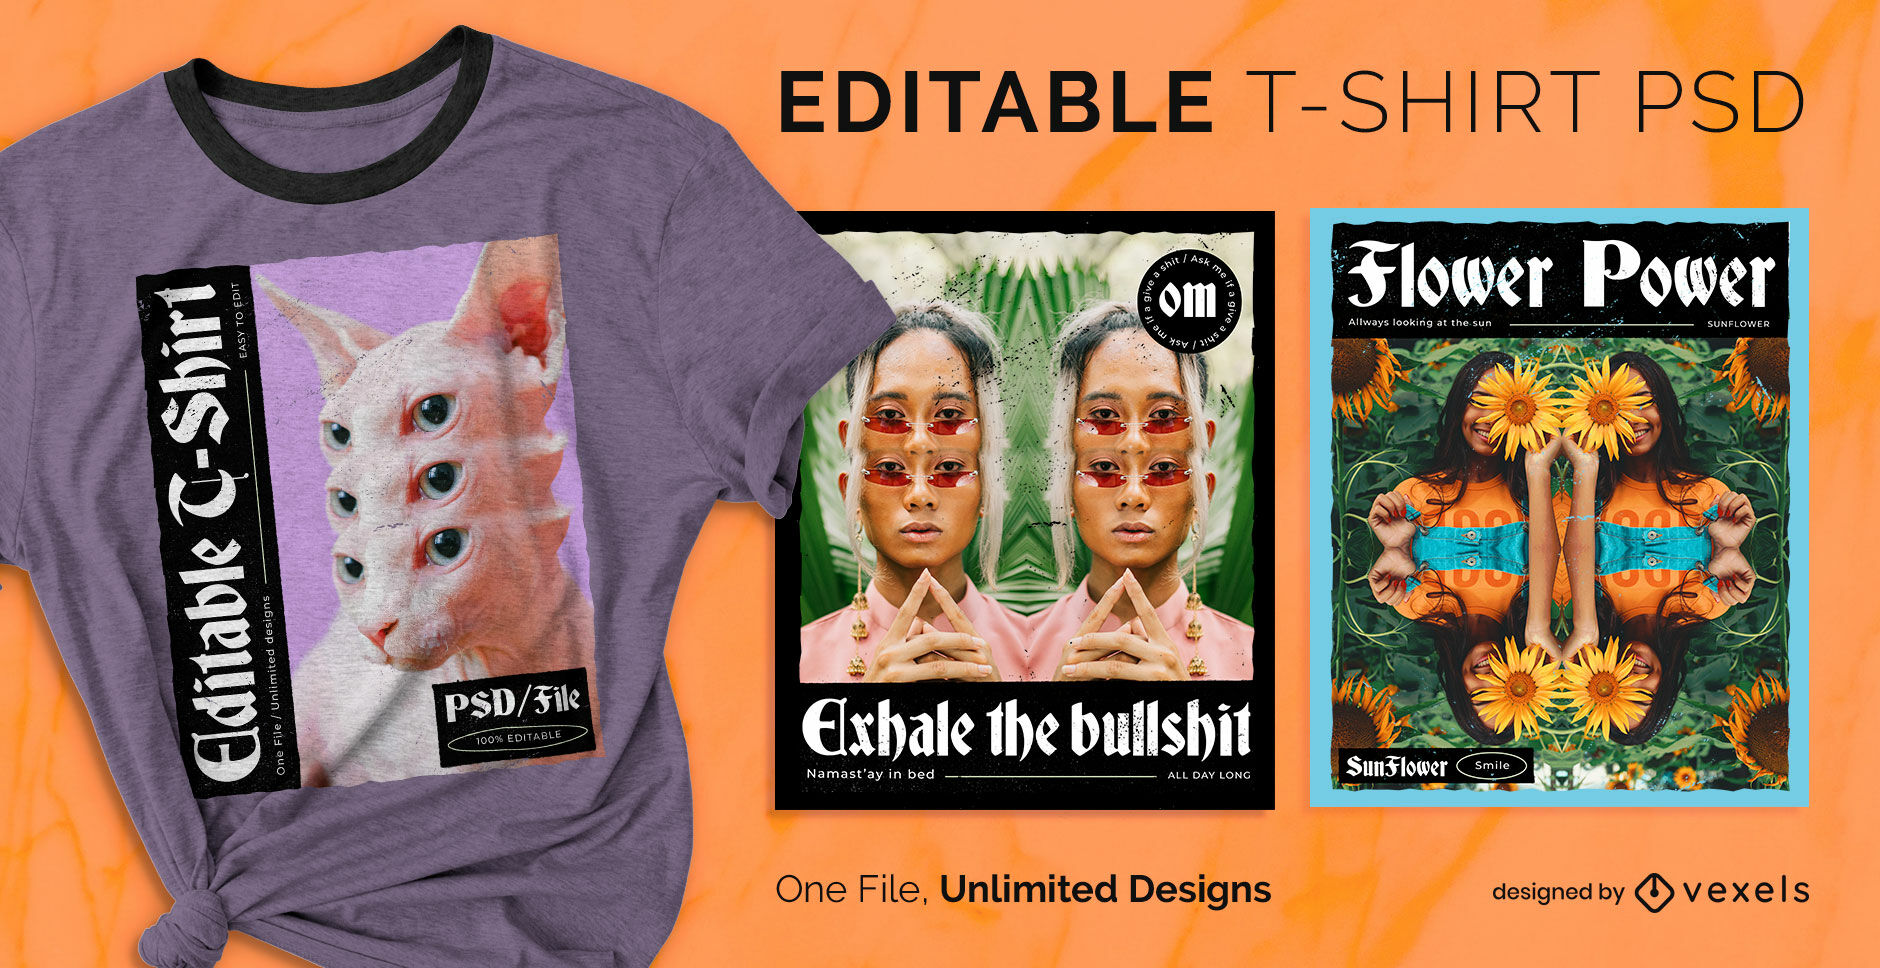 Camiseta escalable imágenes espejadas psd